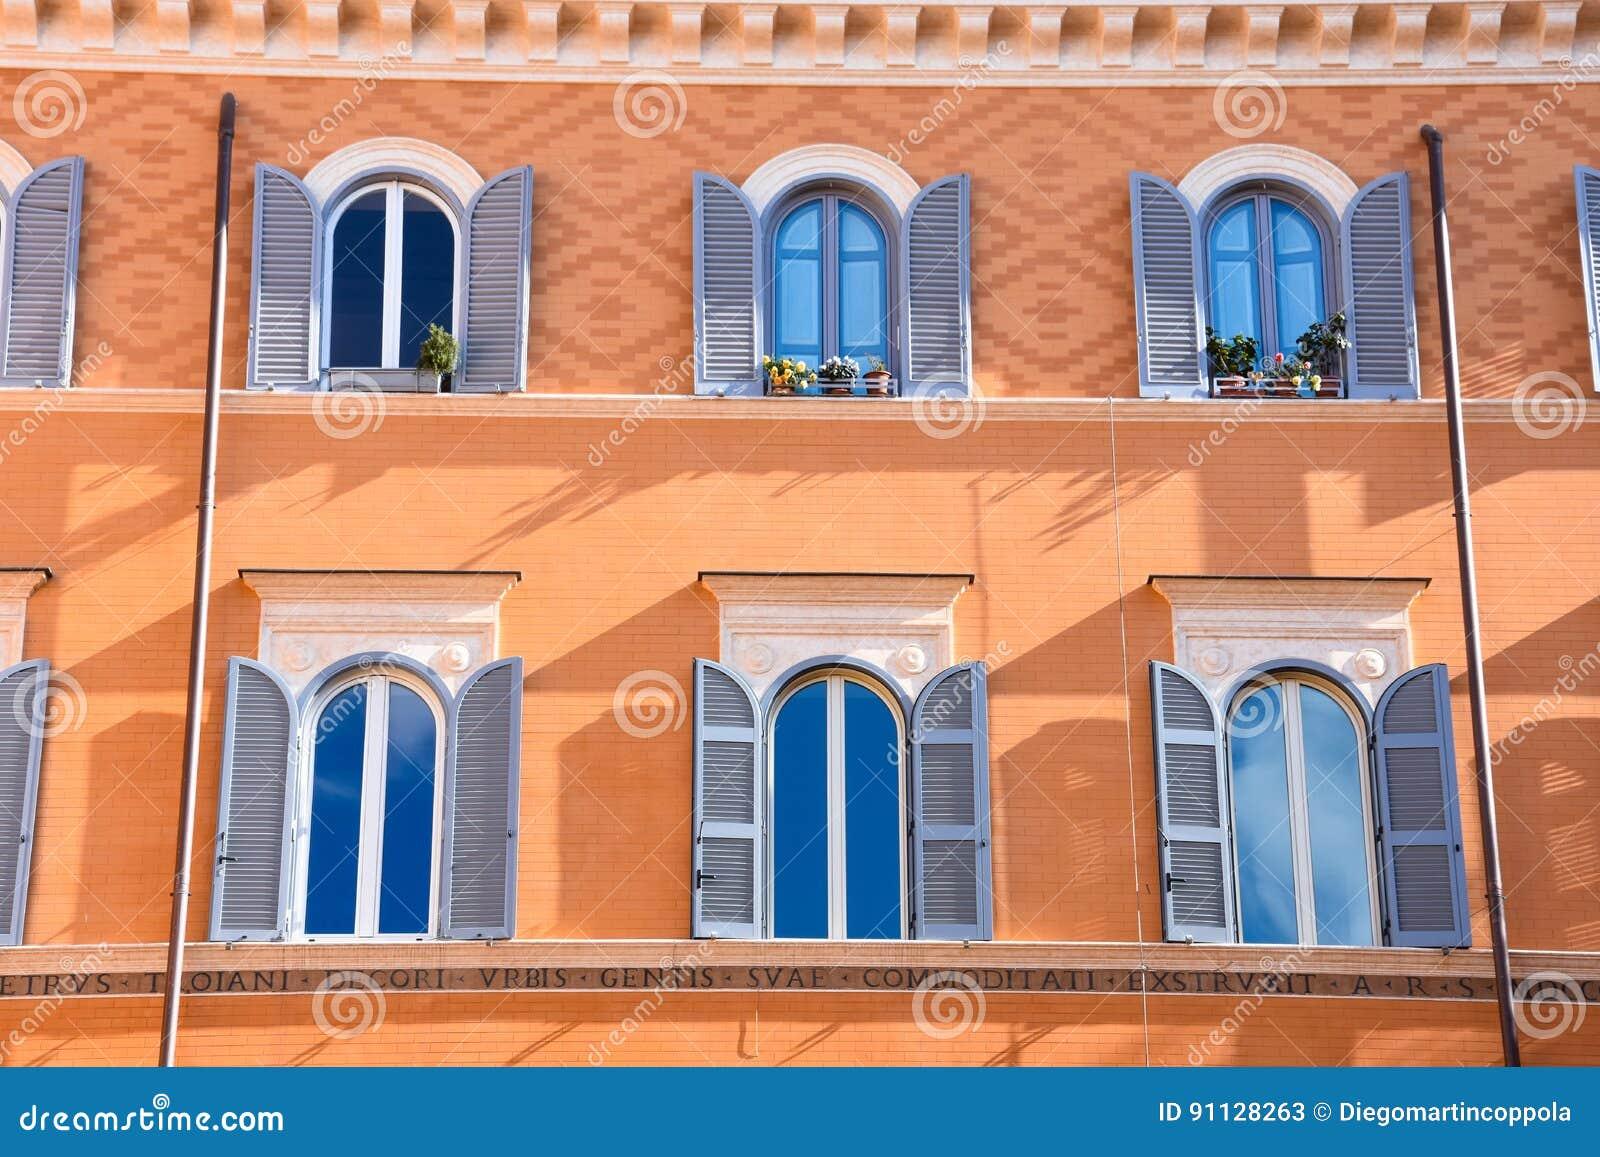 Teatro di Pompeo Квадрат строя цветастый фасад